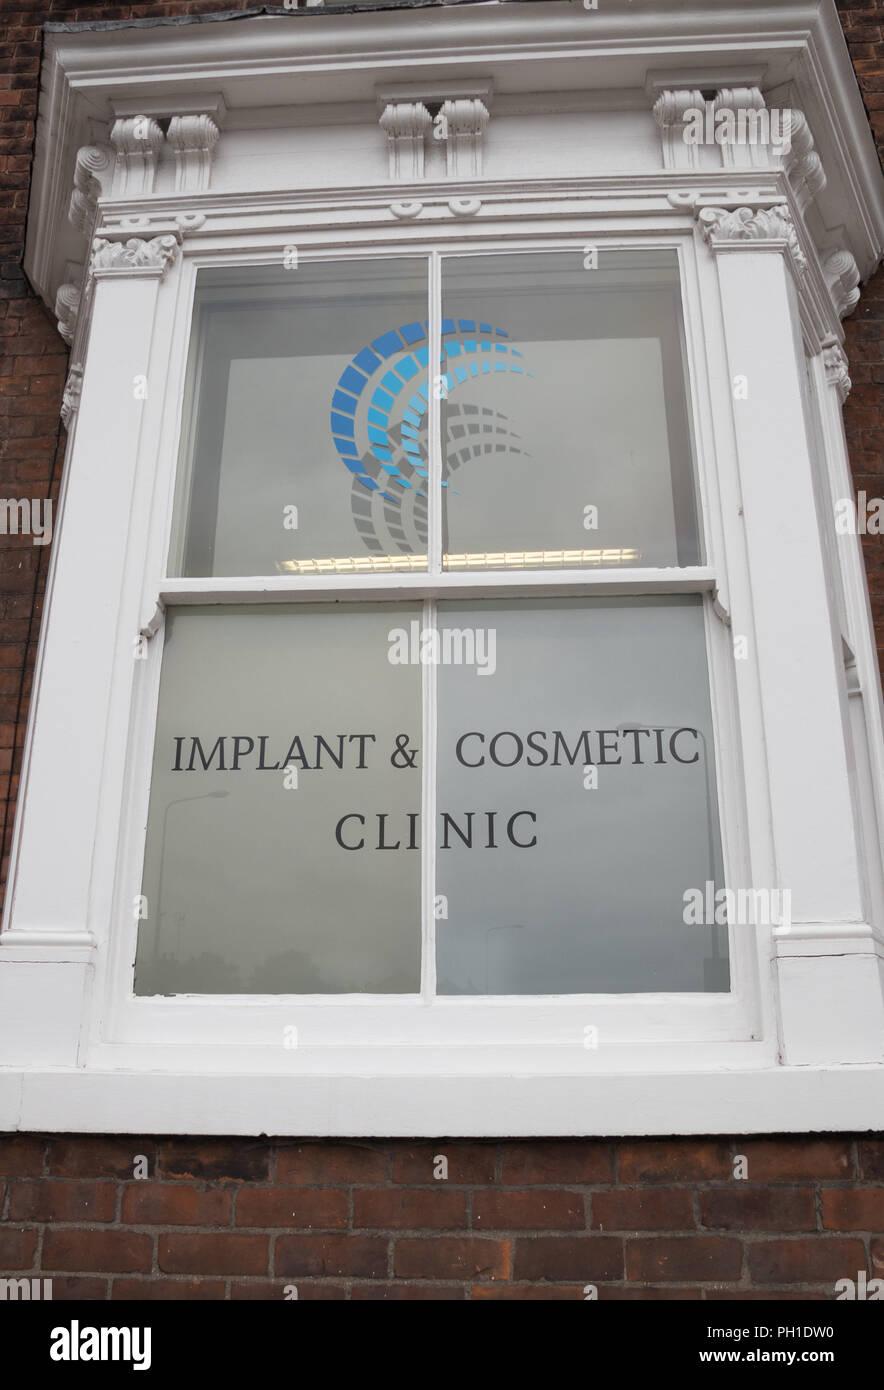 Implantat & Kosmetische Klinik in Beverley, East Yorkshire Stockbild